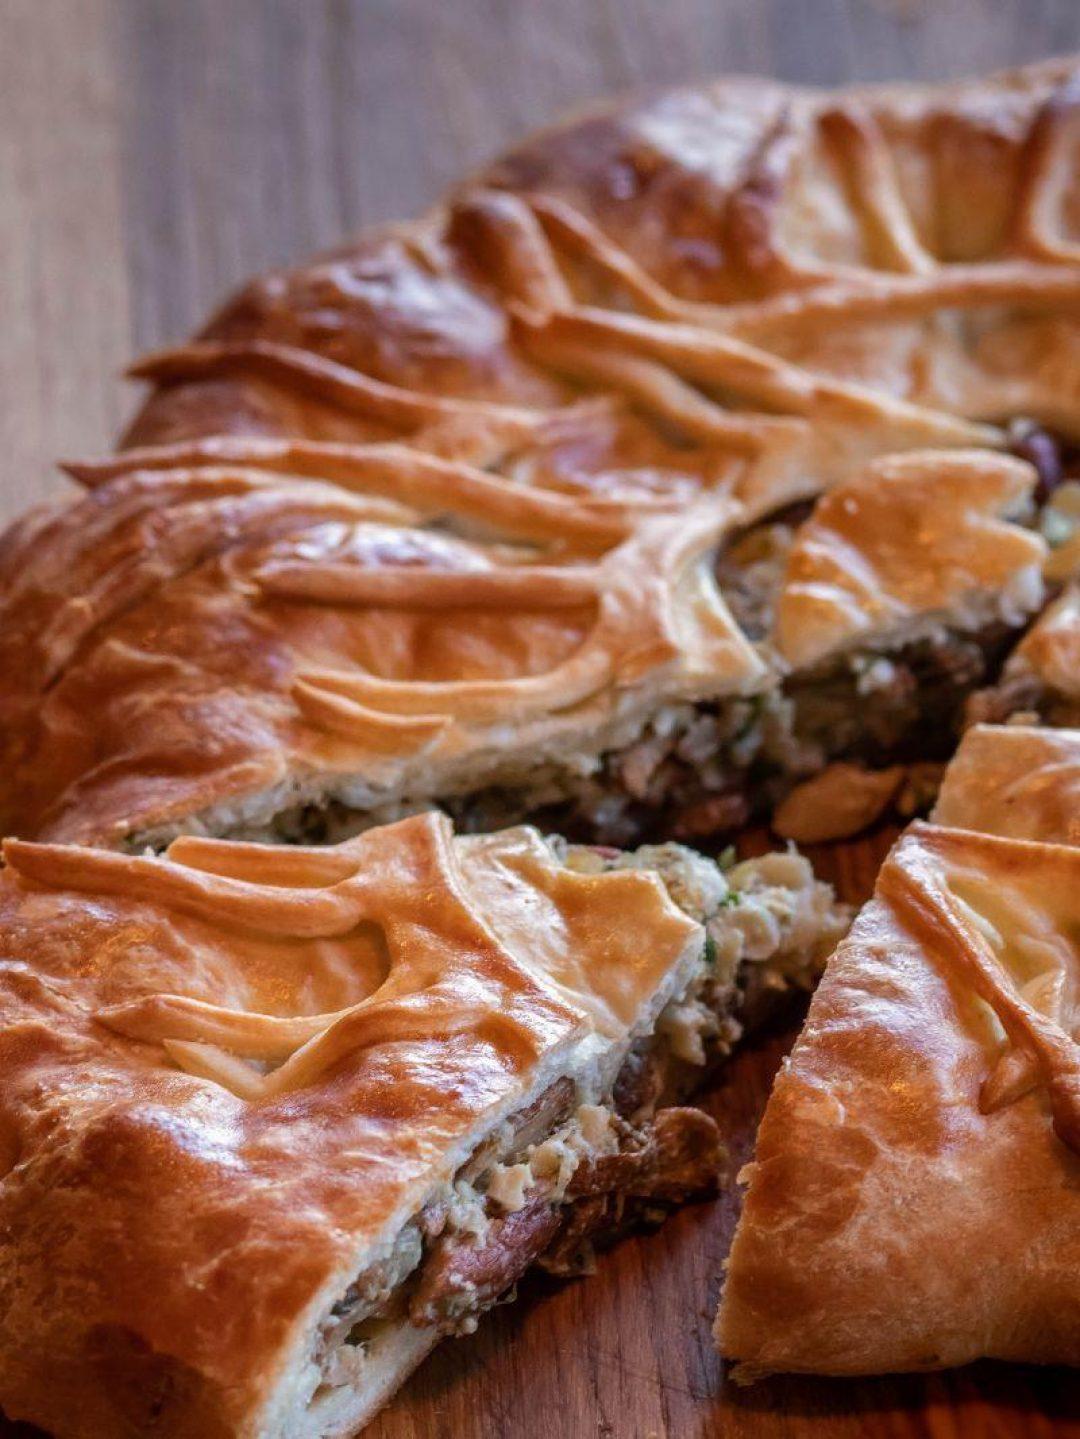 Takeaway pie night Hestercombe